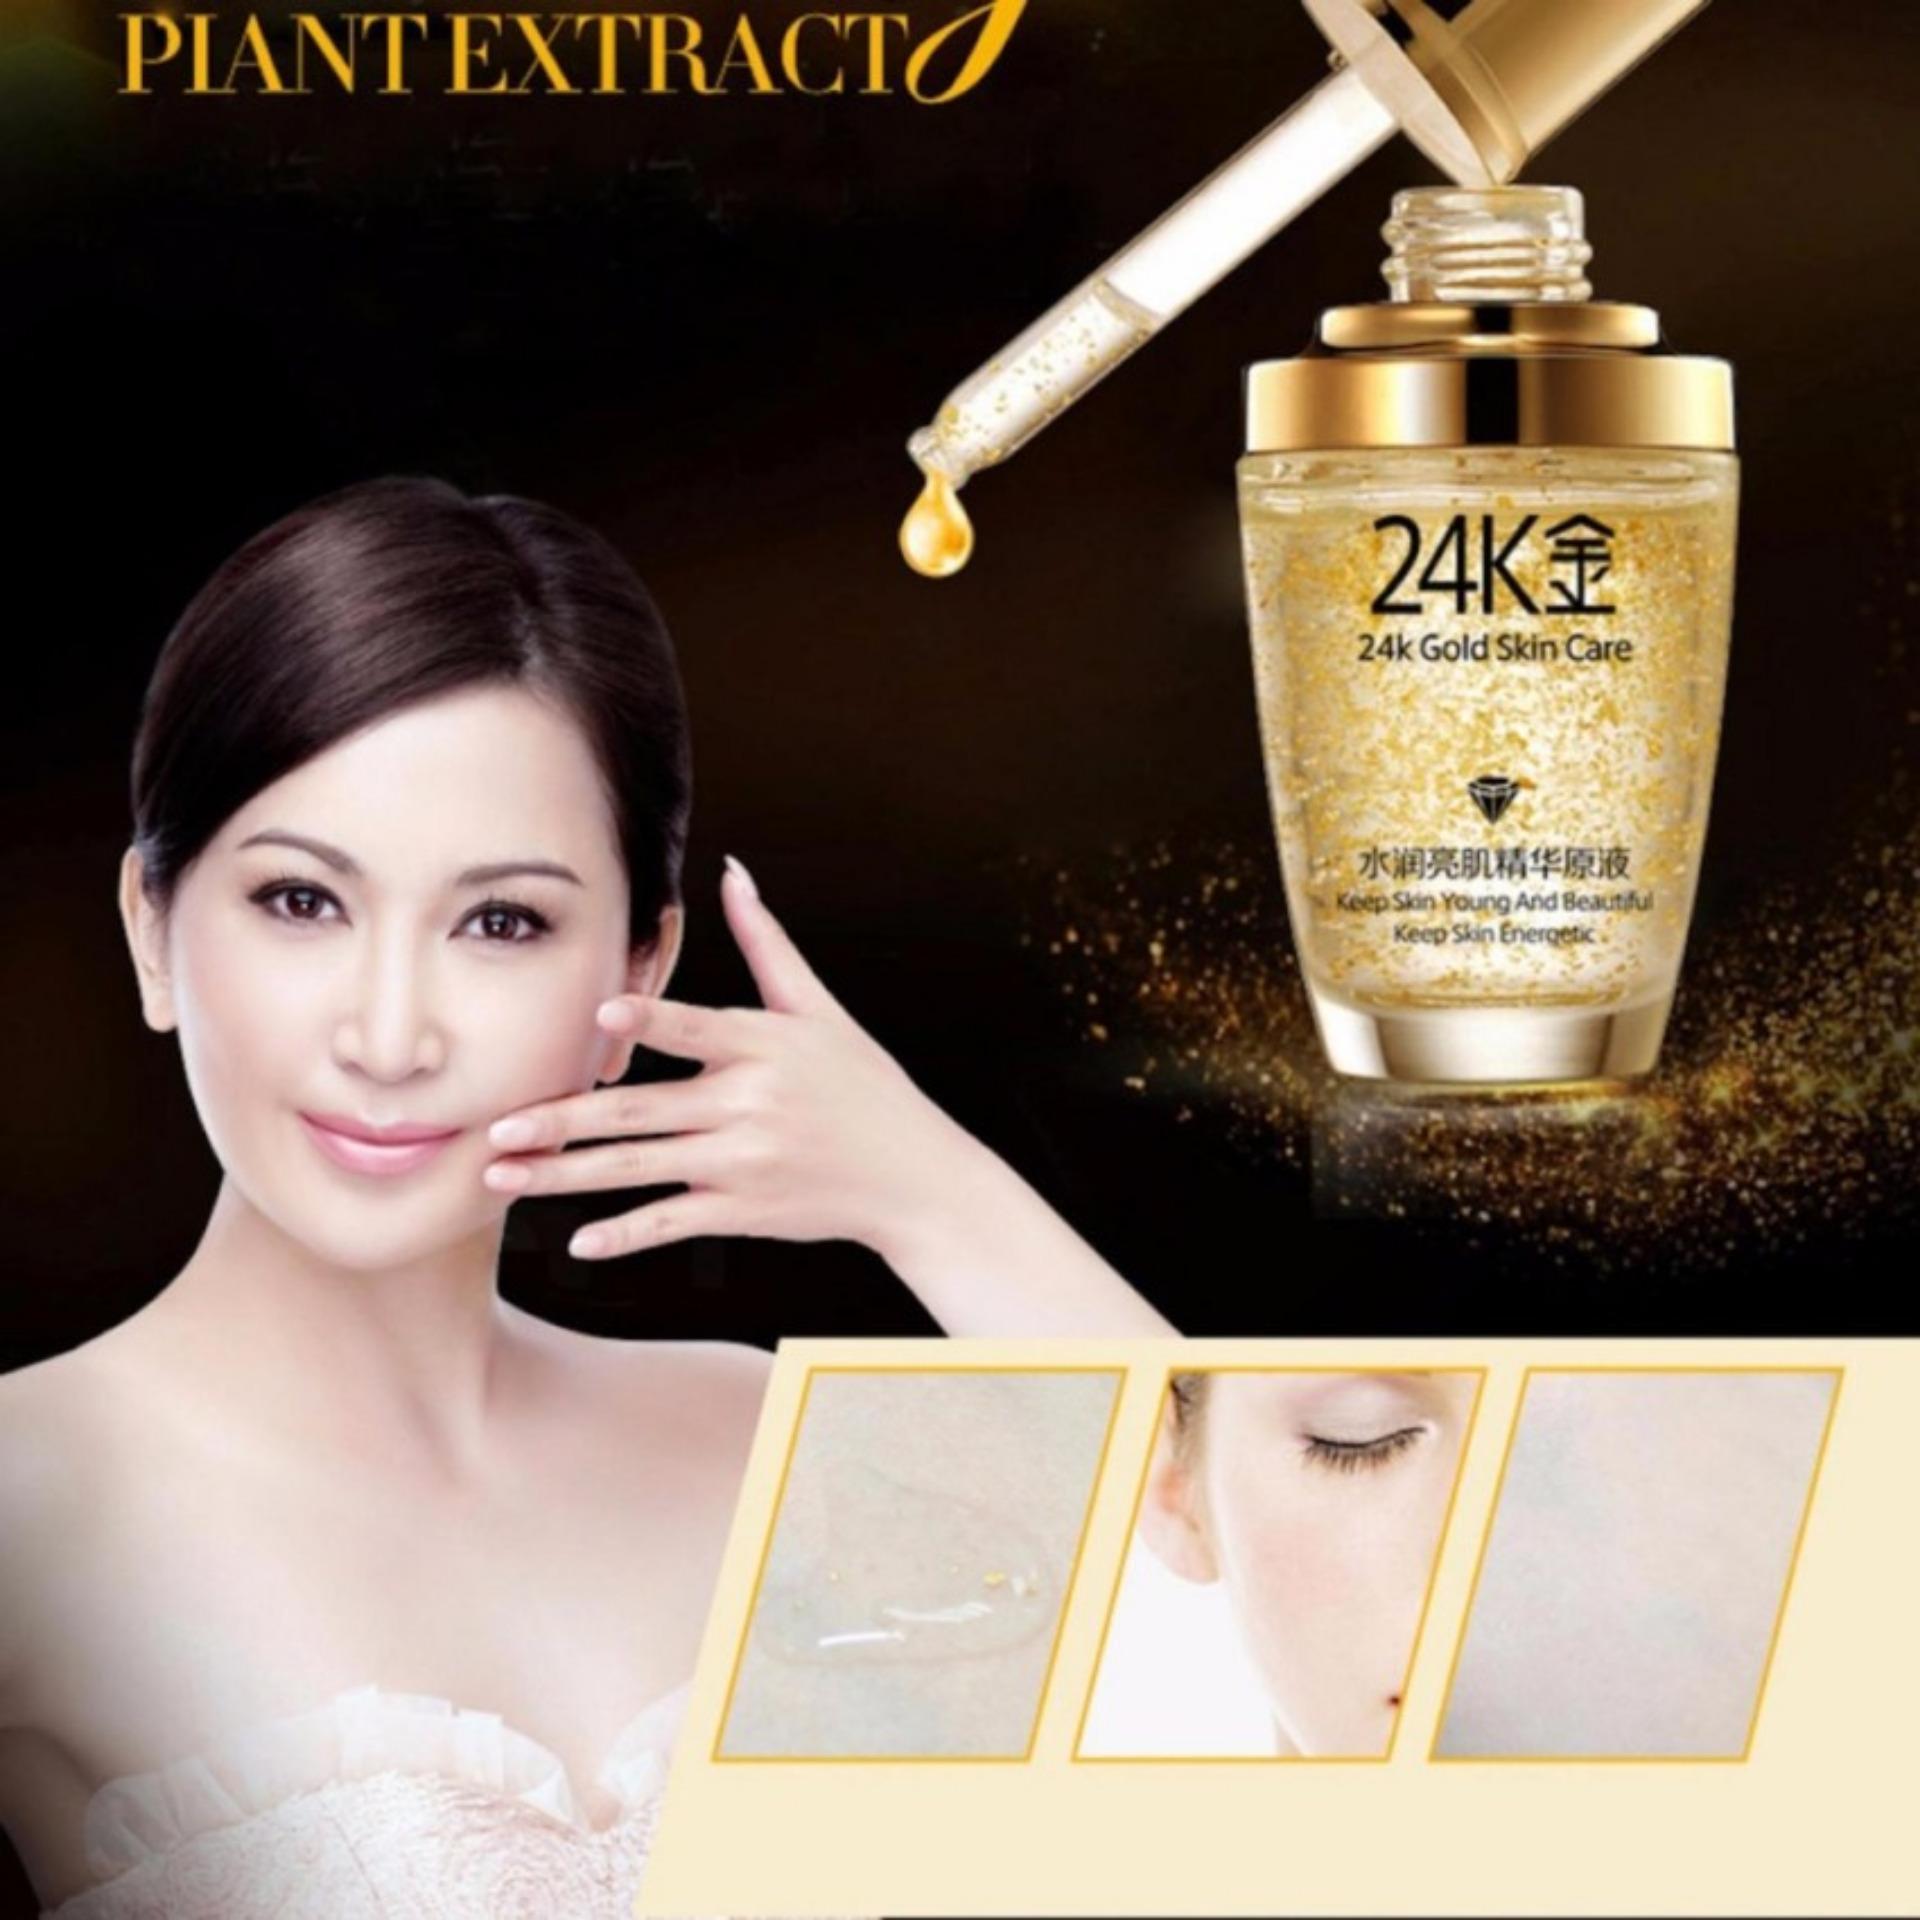 20 Tempat Belanja Online Berbagai Produk Terbaru Emina Beauty Bliss Bb Cream Natural Bioaqua Serum Wajah 24k Gold 30 Ml